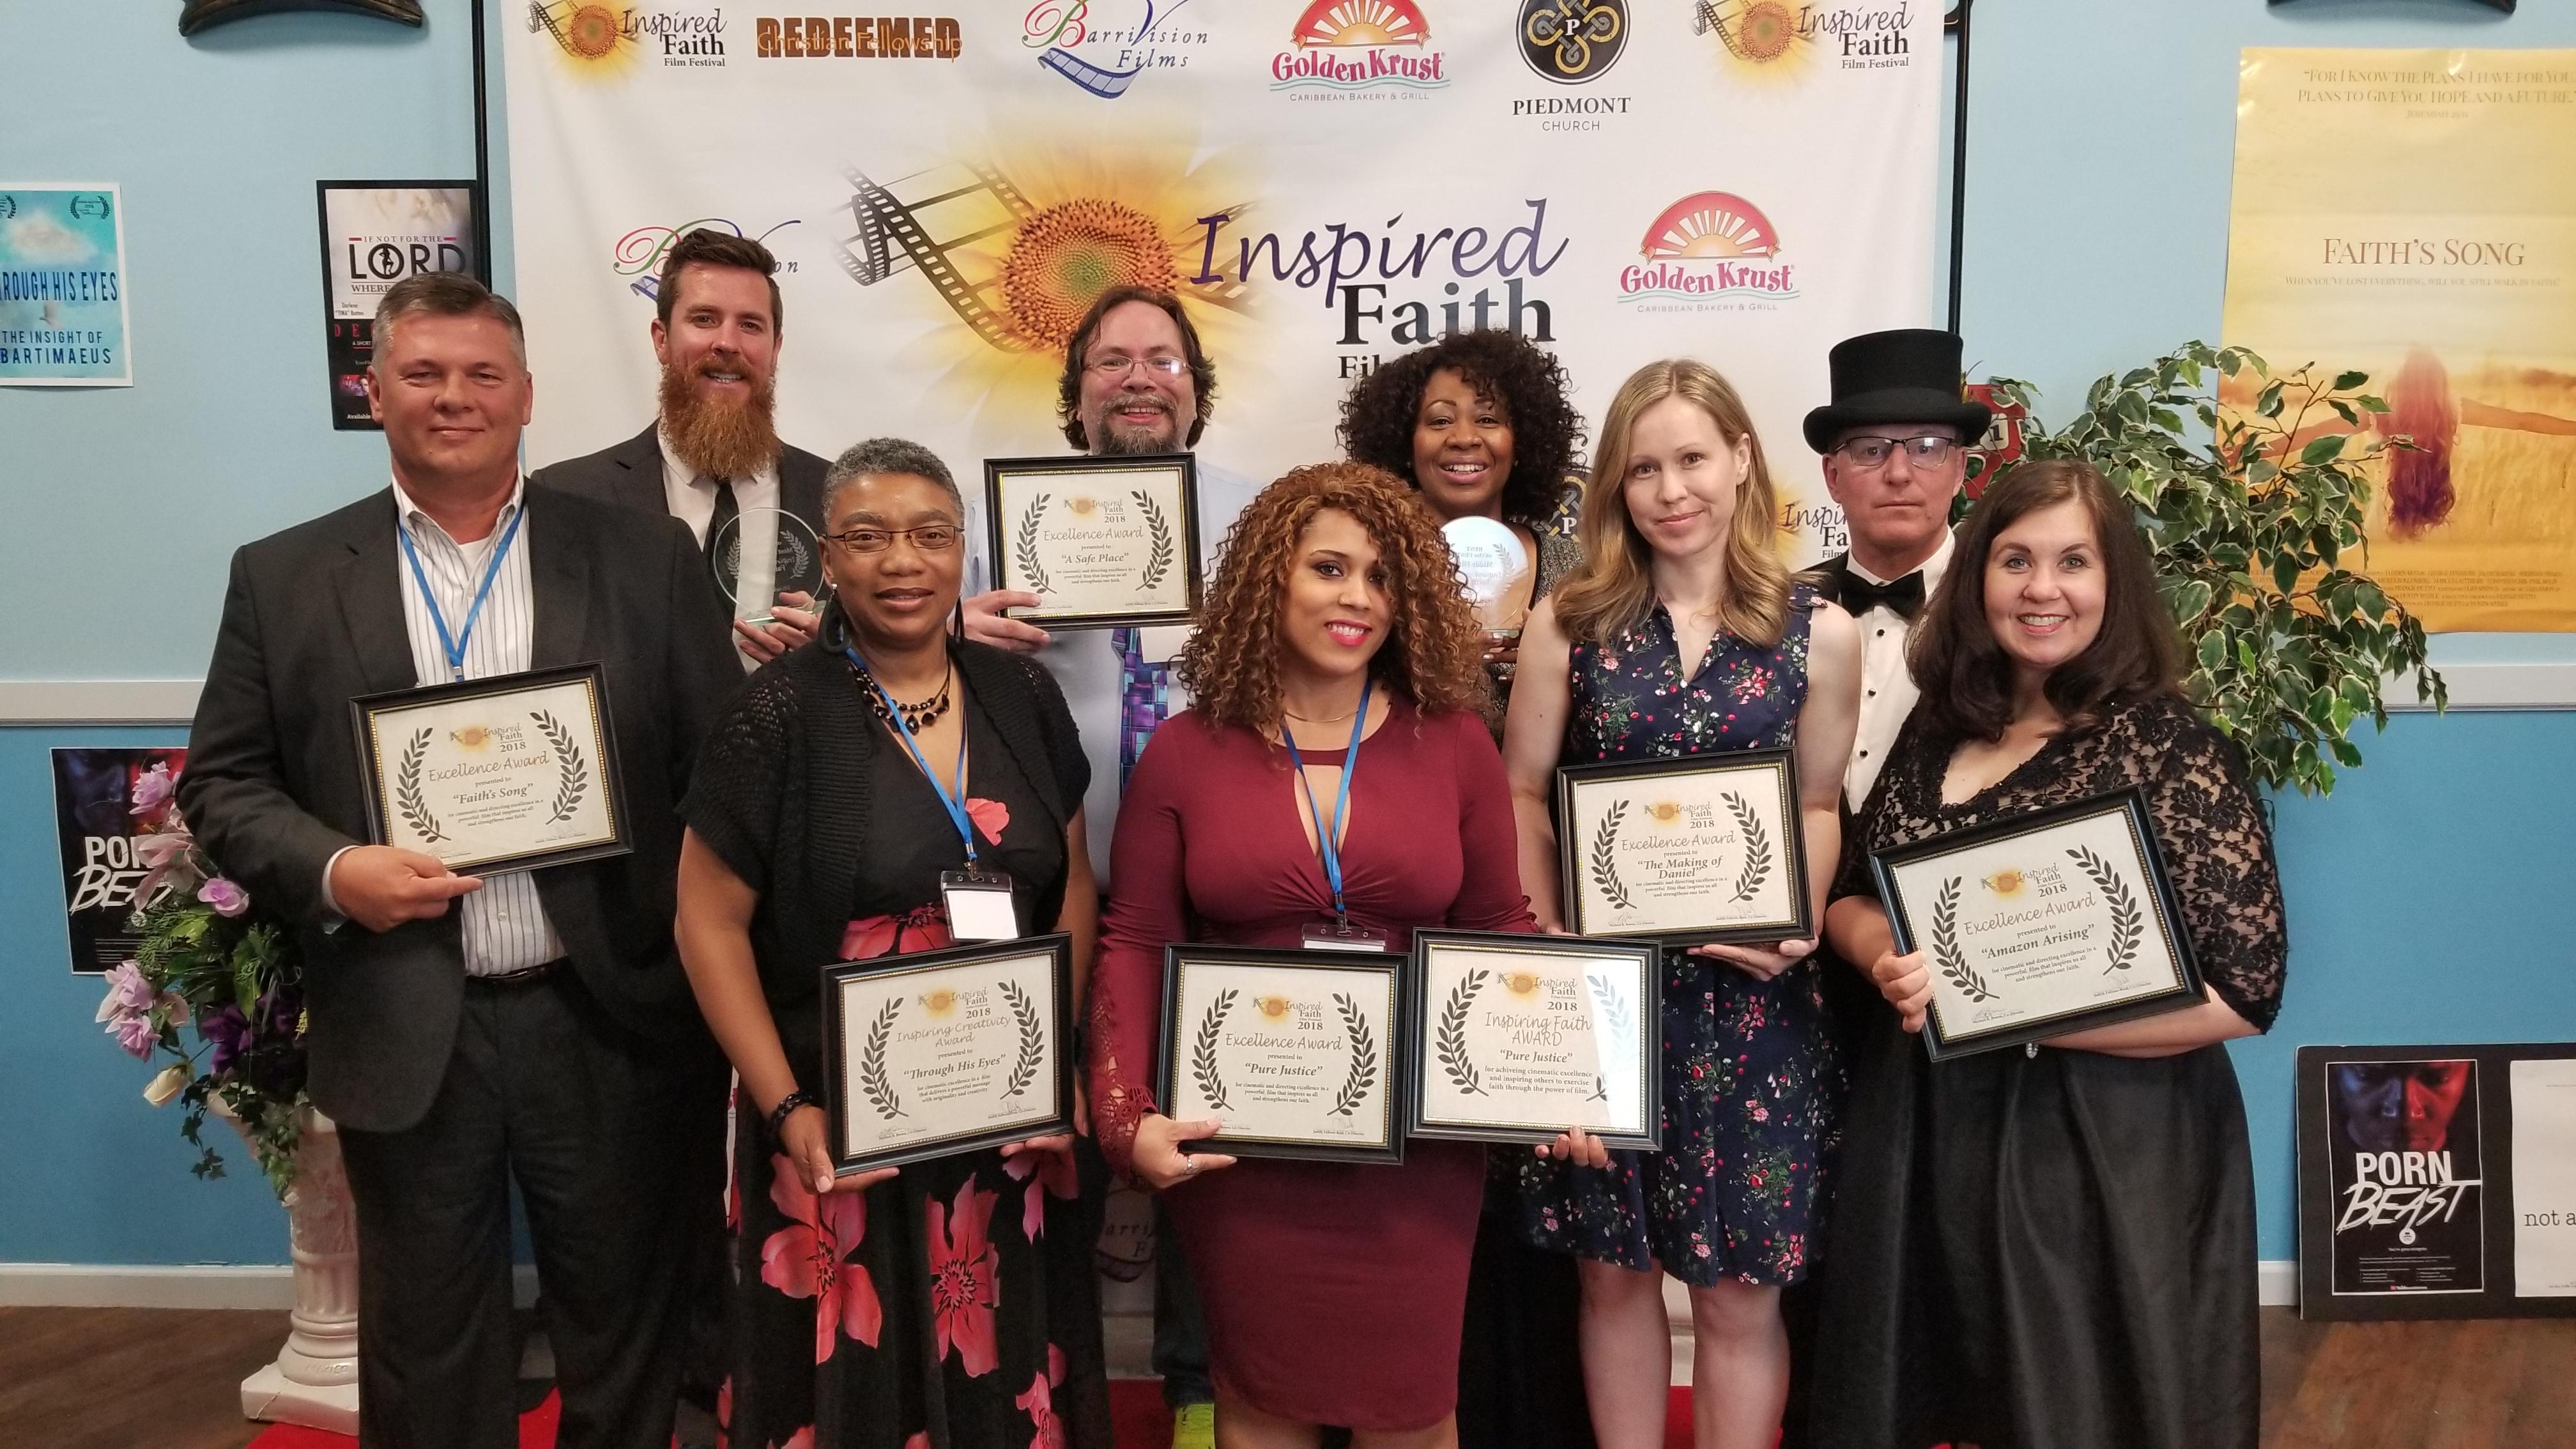 Inspire Faith Honorees